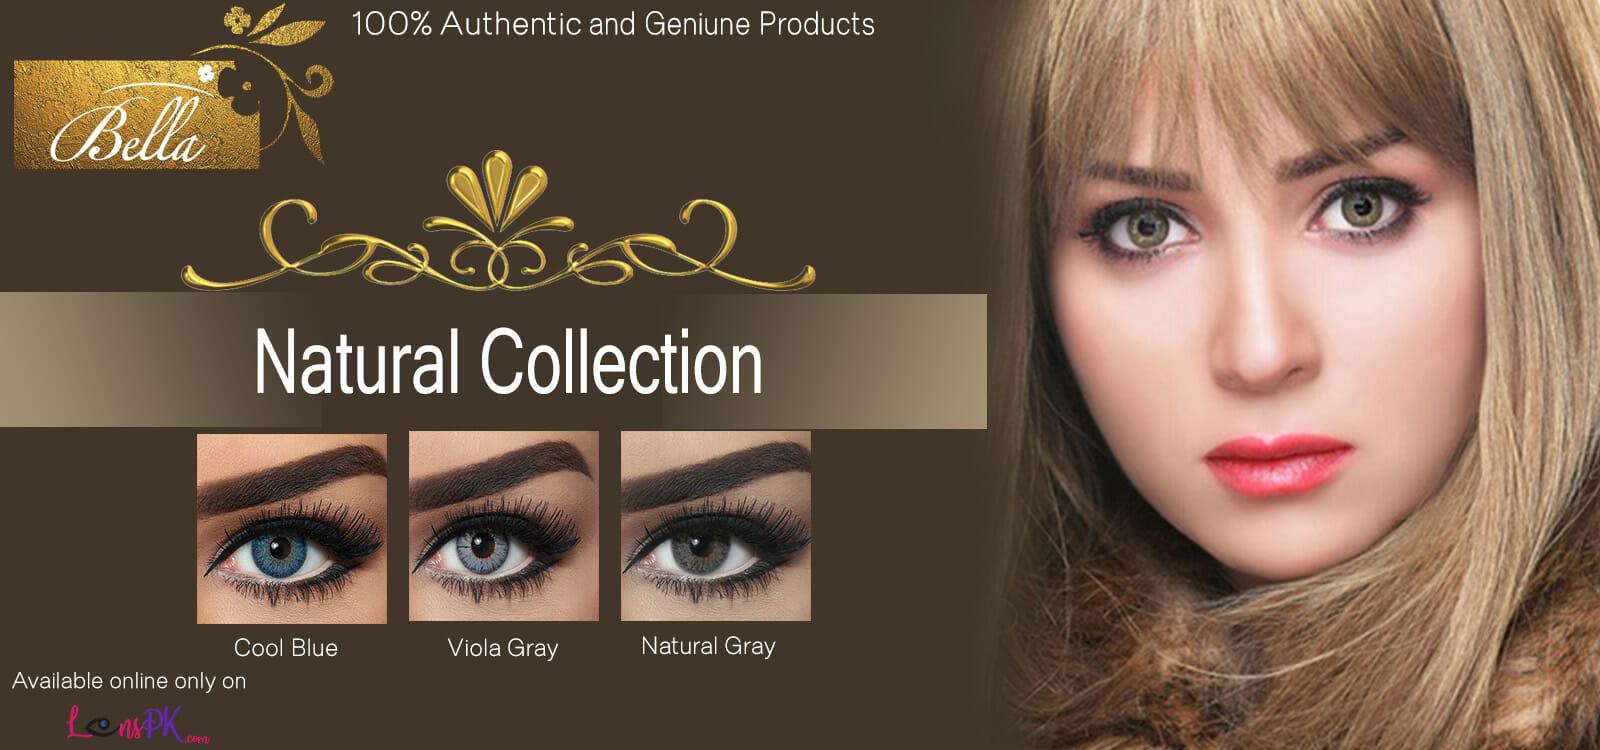 Buy Bella Contact Lenses - Glow Collection - lenspk.com